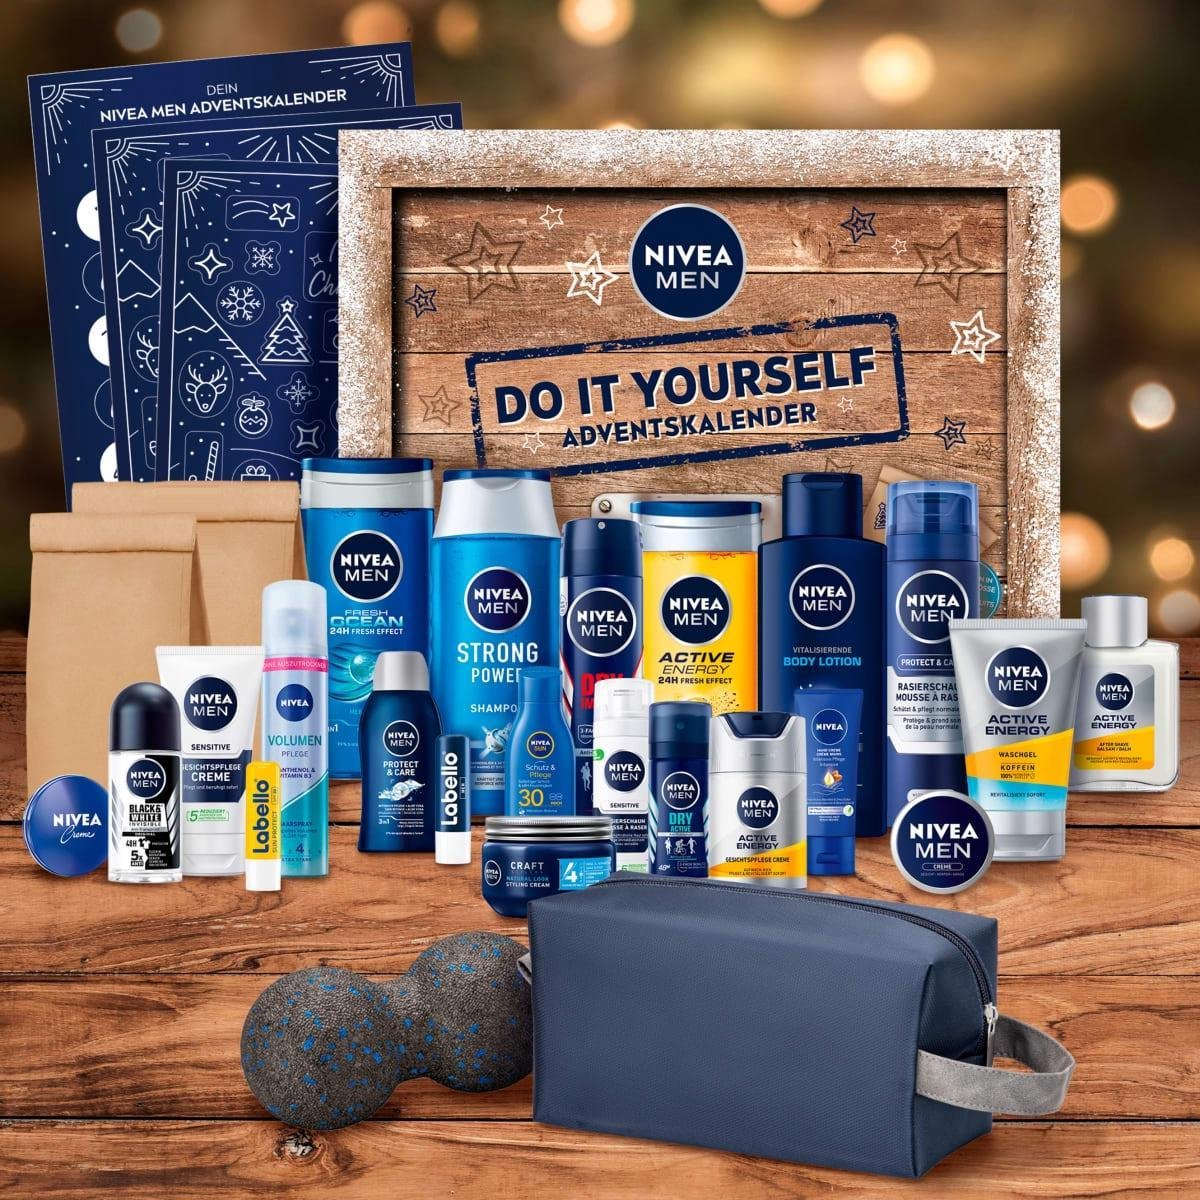 NIVEA MEN Adventskalender 2021 - do it yourself